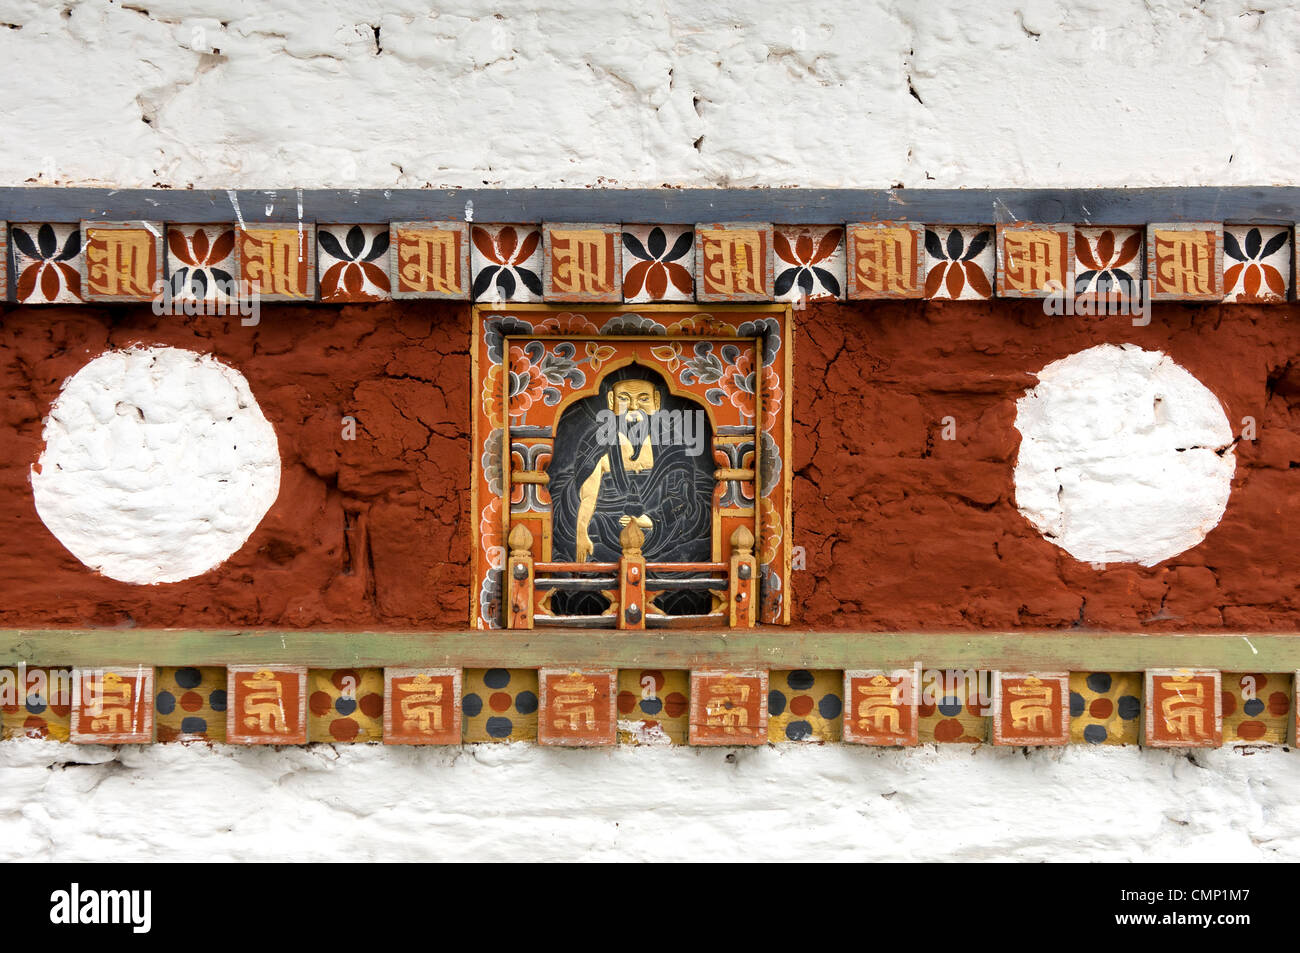 Details of a chorten at the memorial of the 108 Druk Wangyal Khangzang Chortens on the Dochula pass, Bhutan Stock Photo